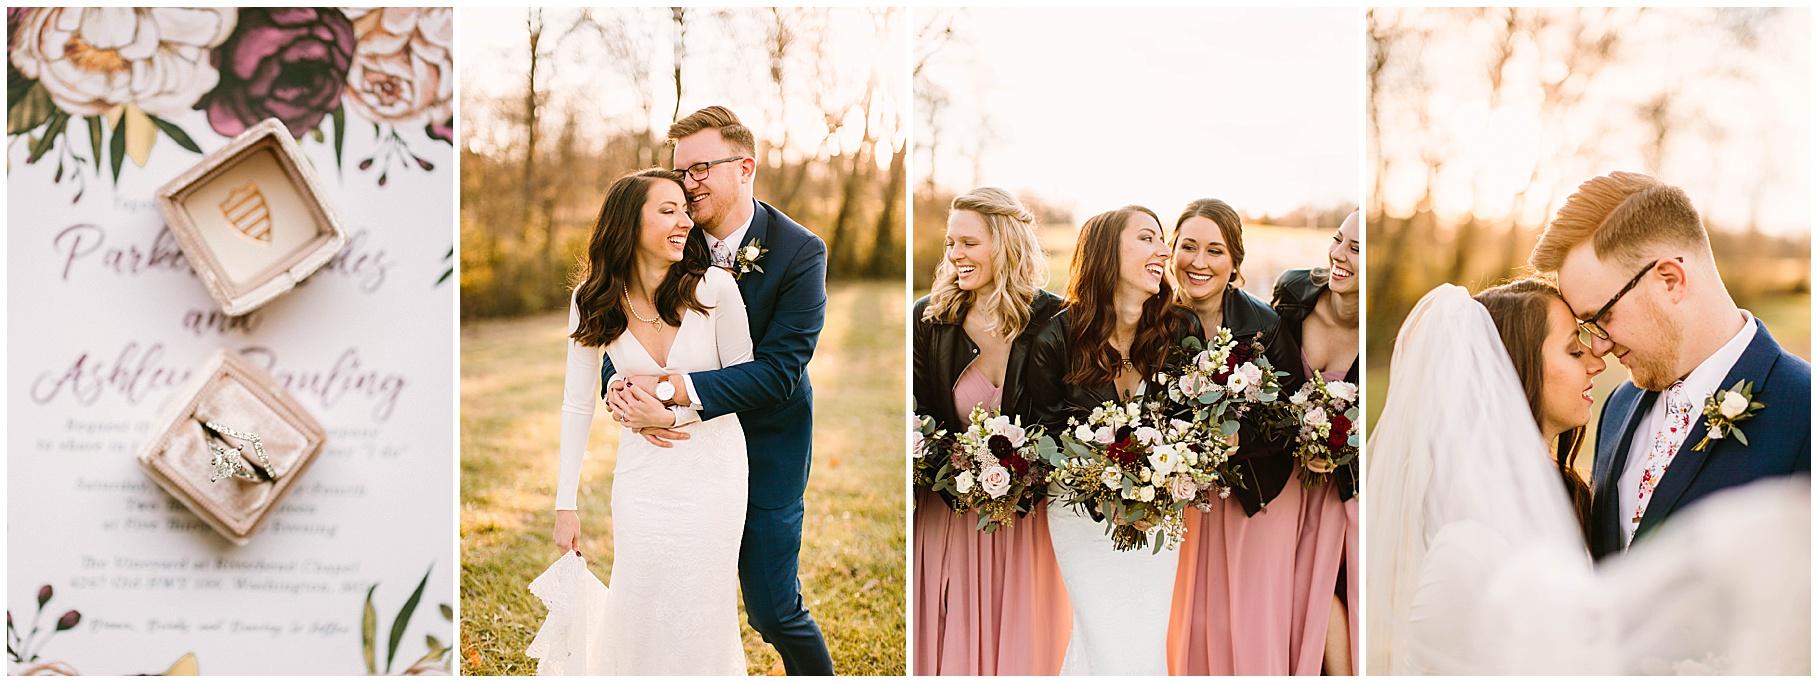 Veronica young photography, St. Louis wedding photographer, leather jacket wedding inspo